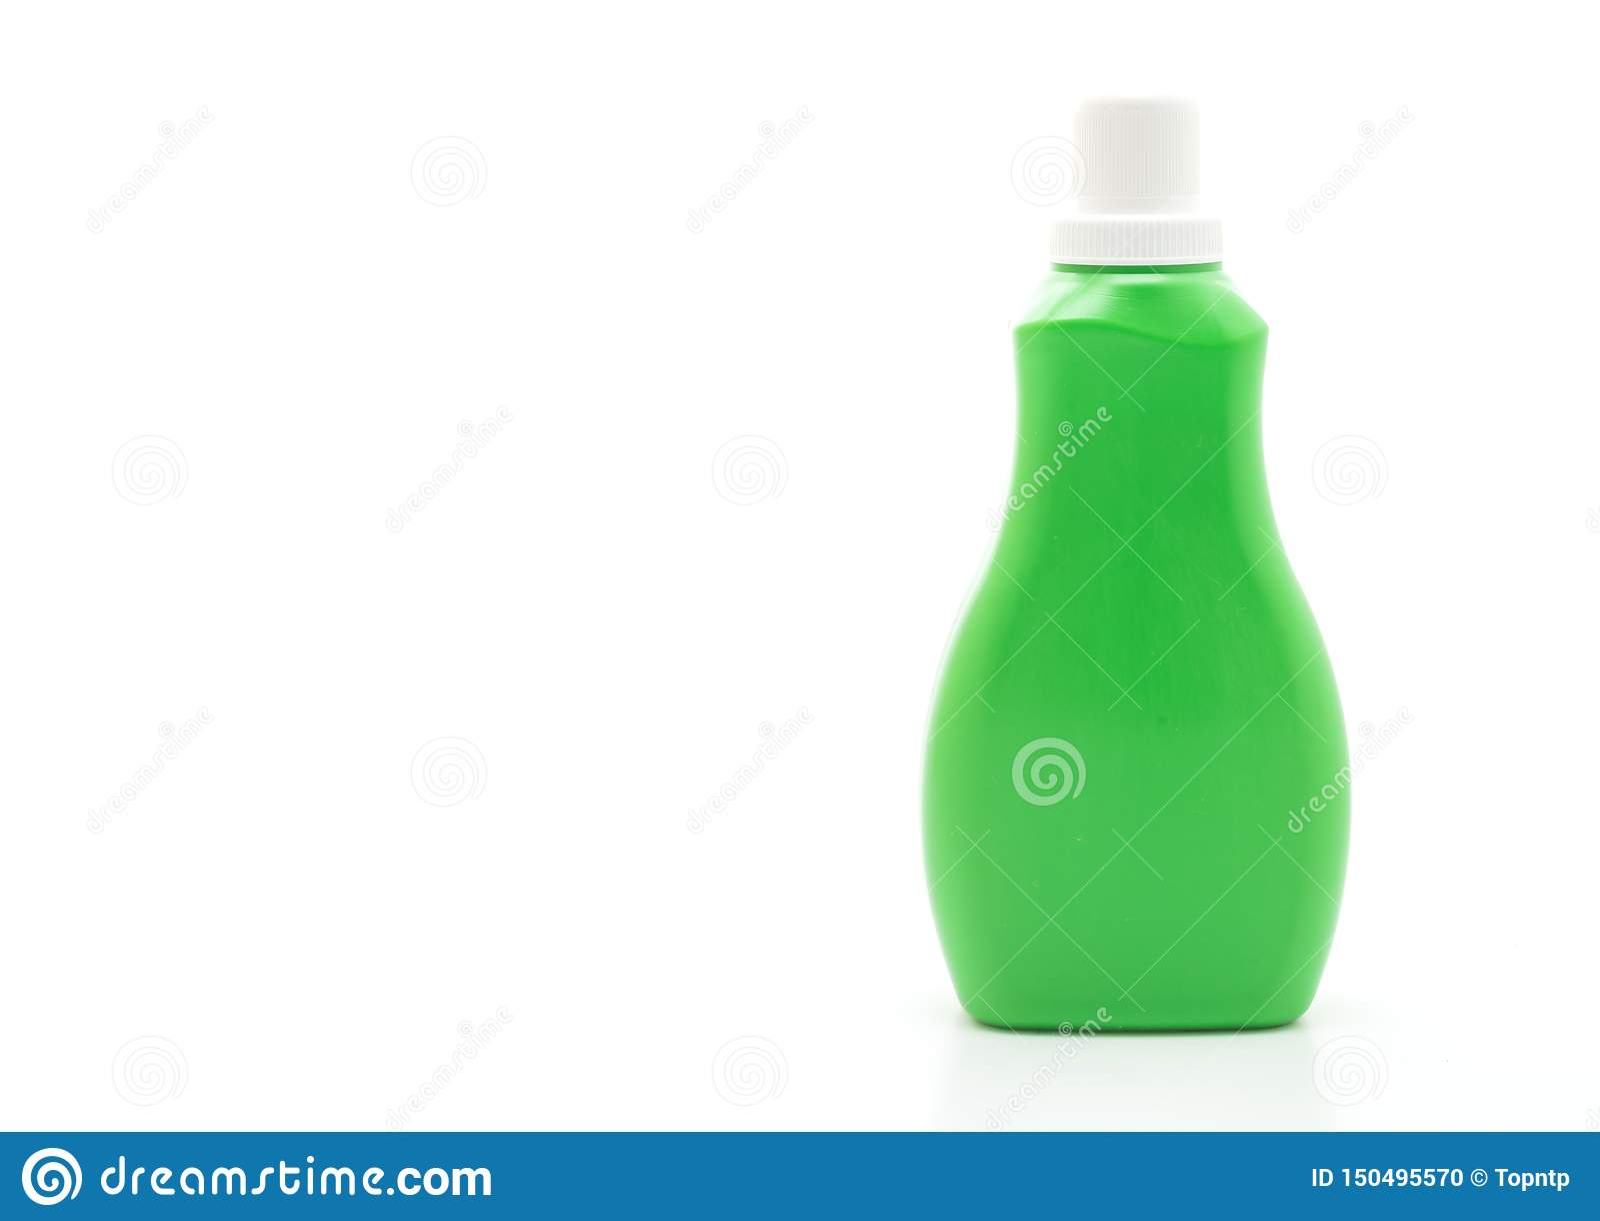 green plastic bottle for detergent or floor liquid cleaning on white background